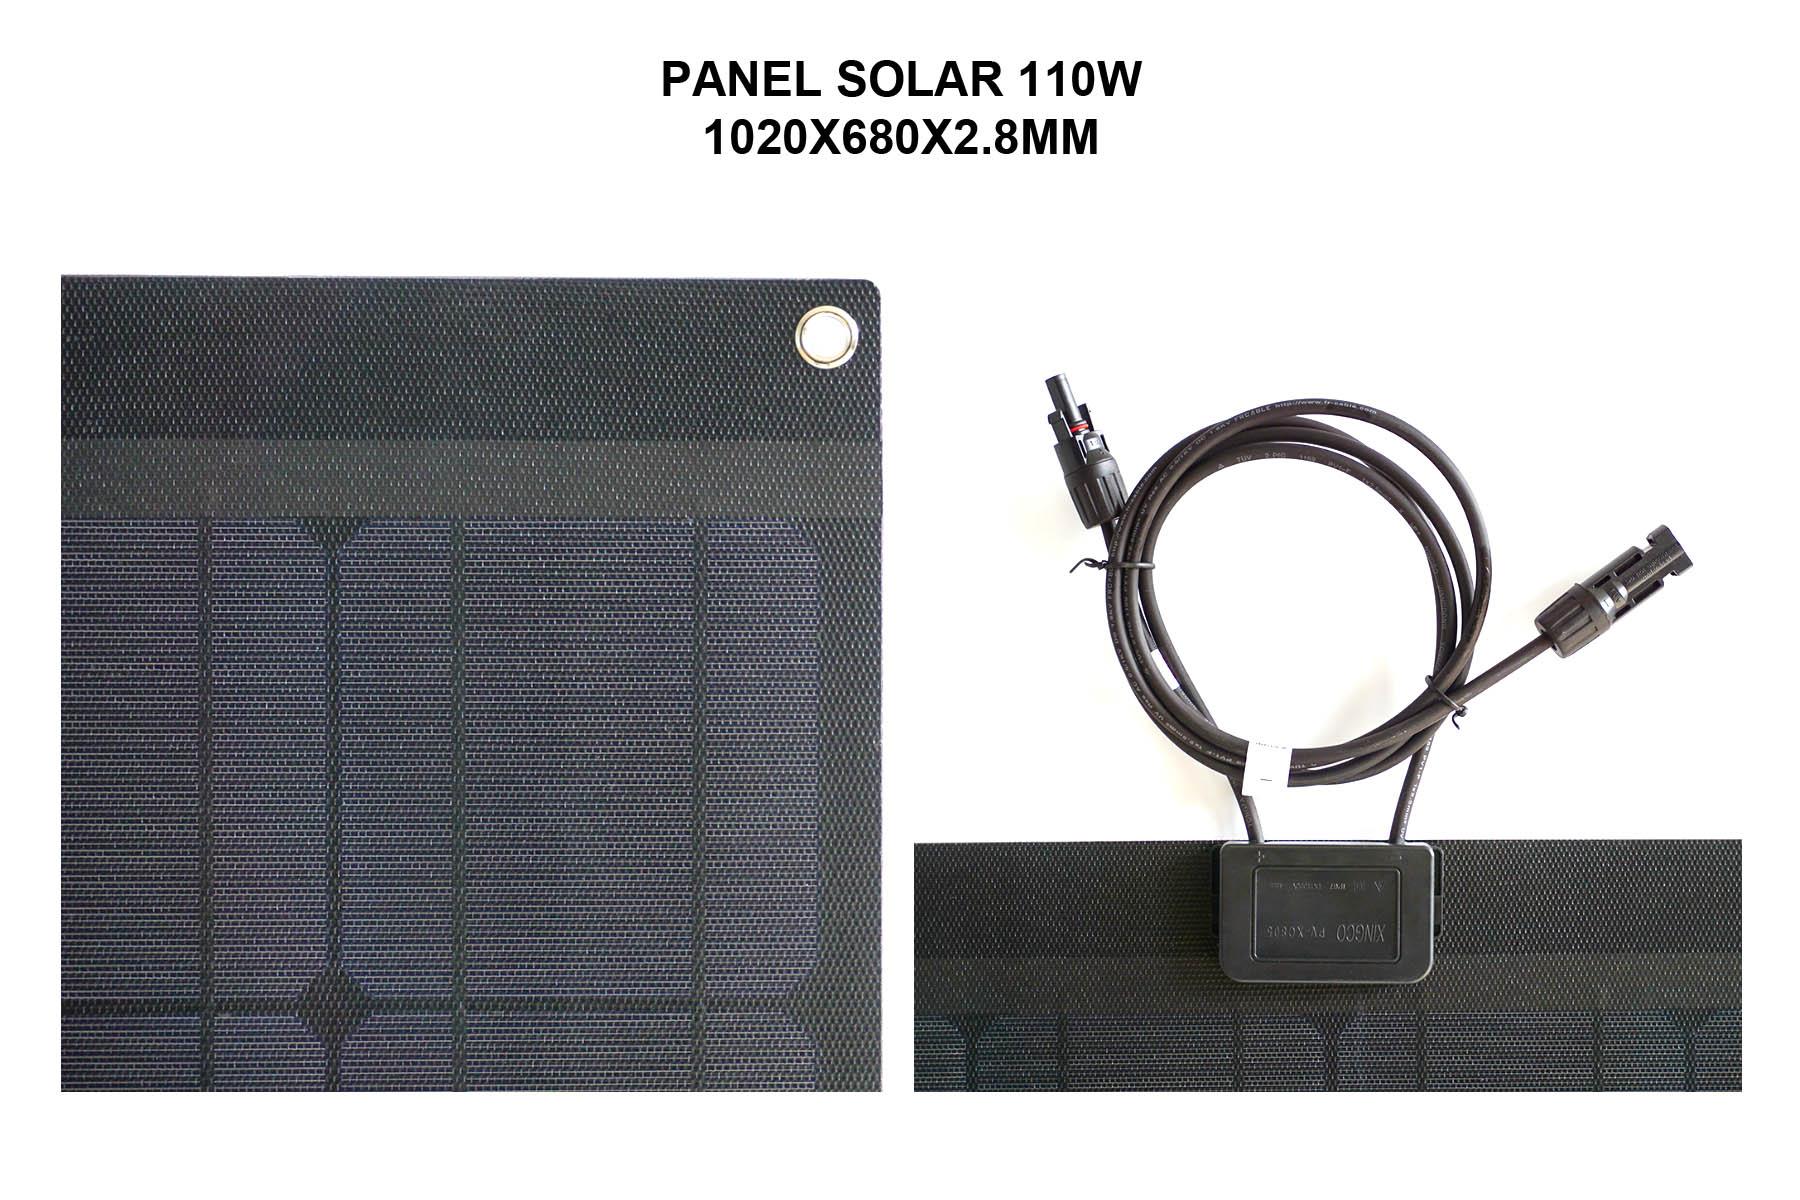 PANEL SOLAR 110W 1020X680X2.8MM